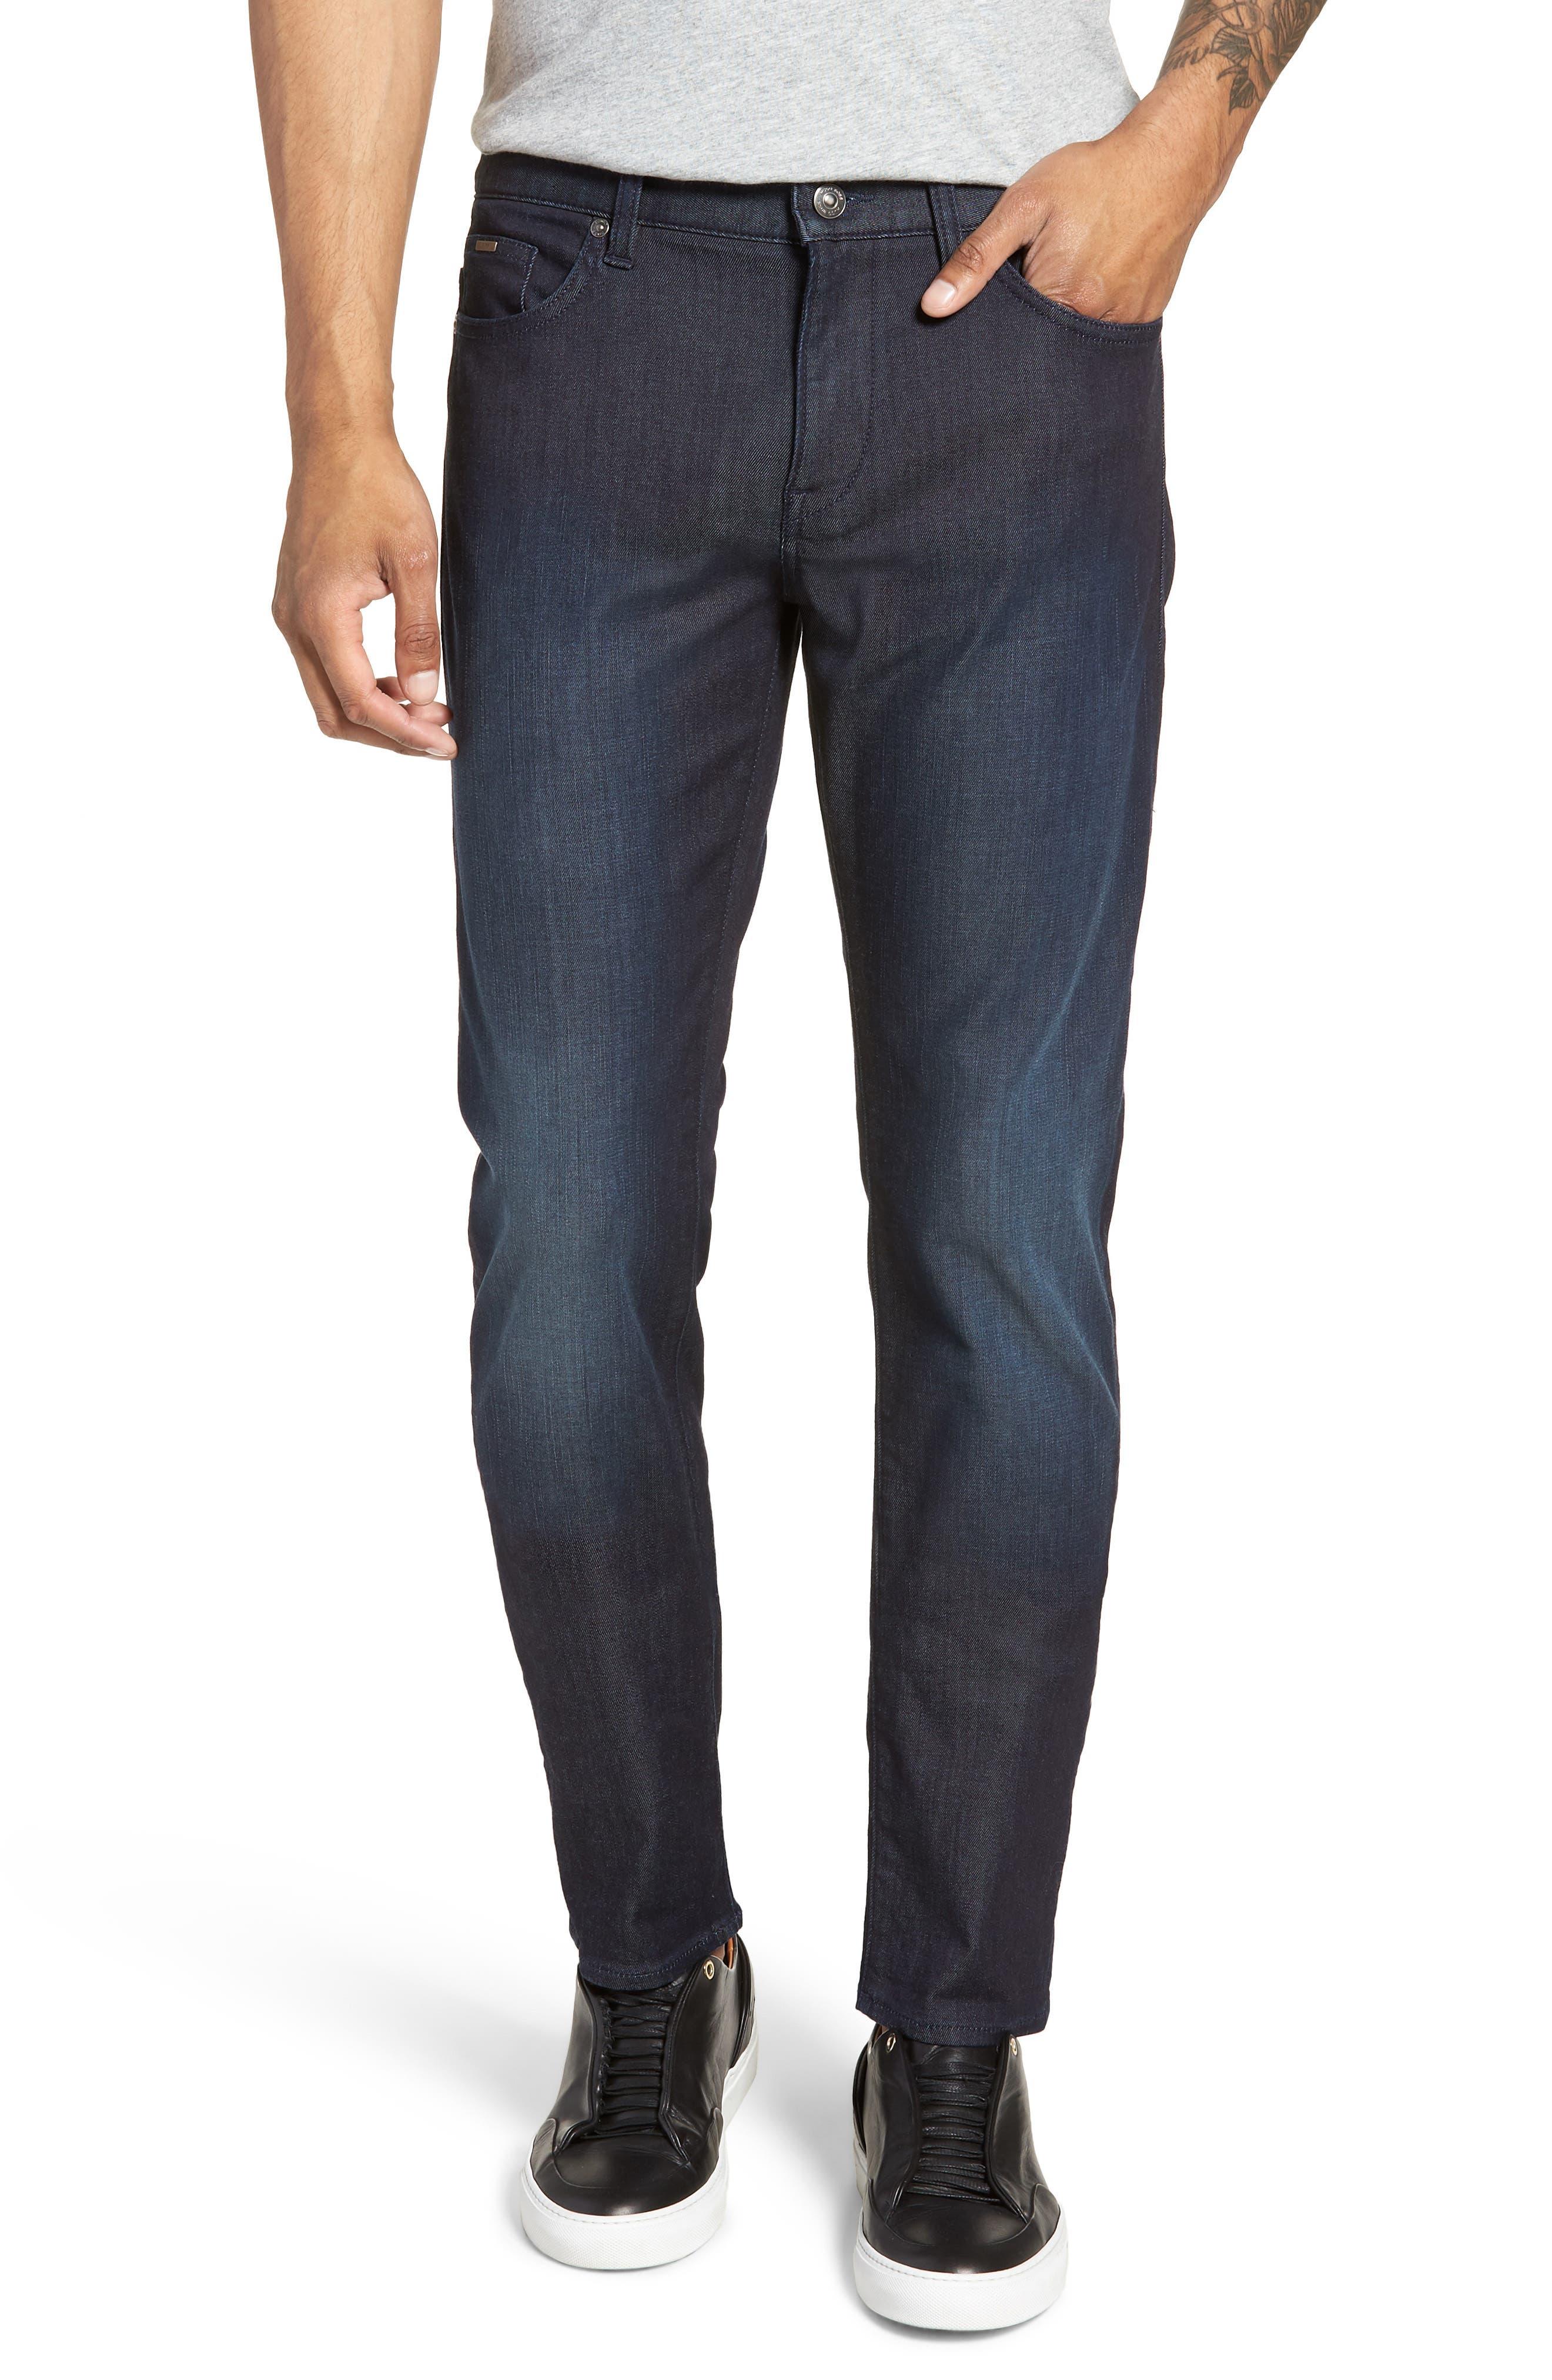 Delaware Slim Fit Jeans,                         Main,                         color, Blue